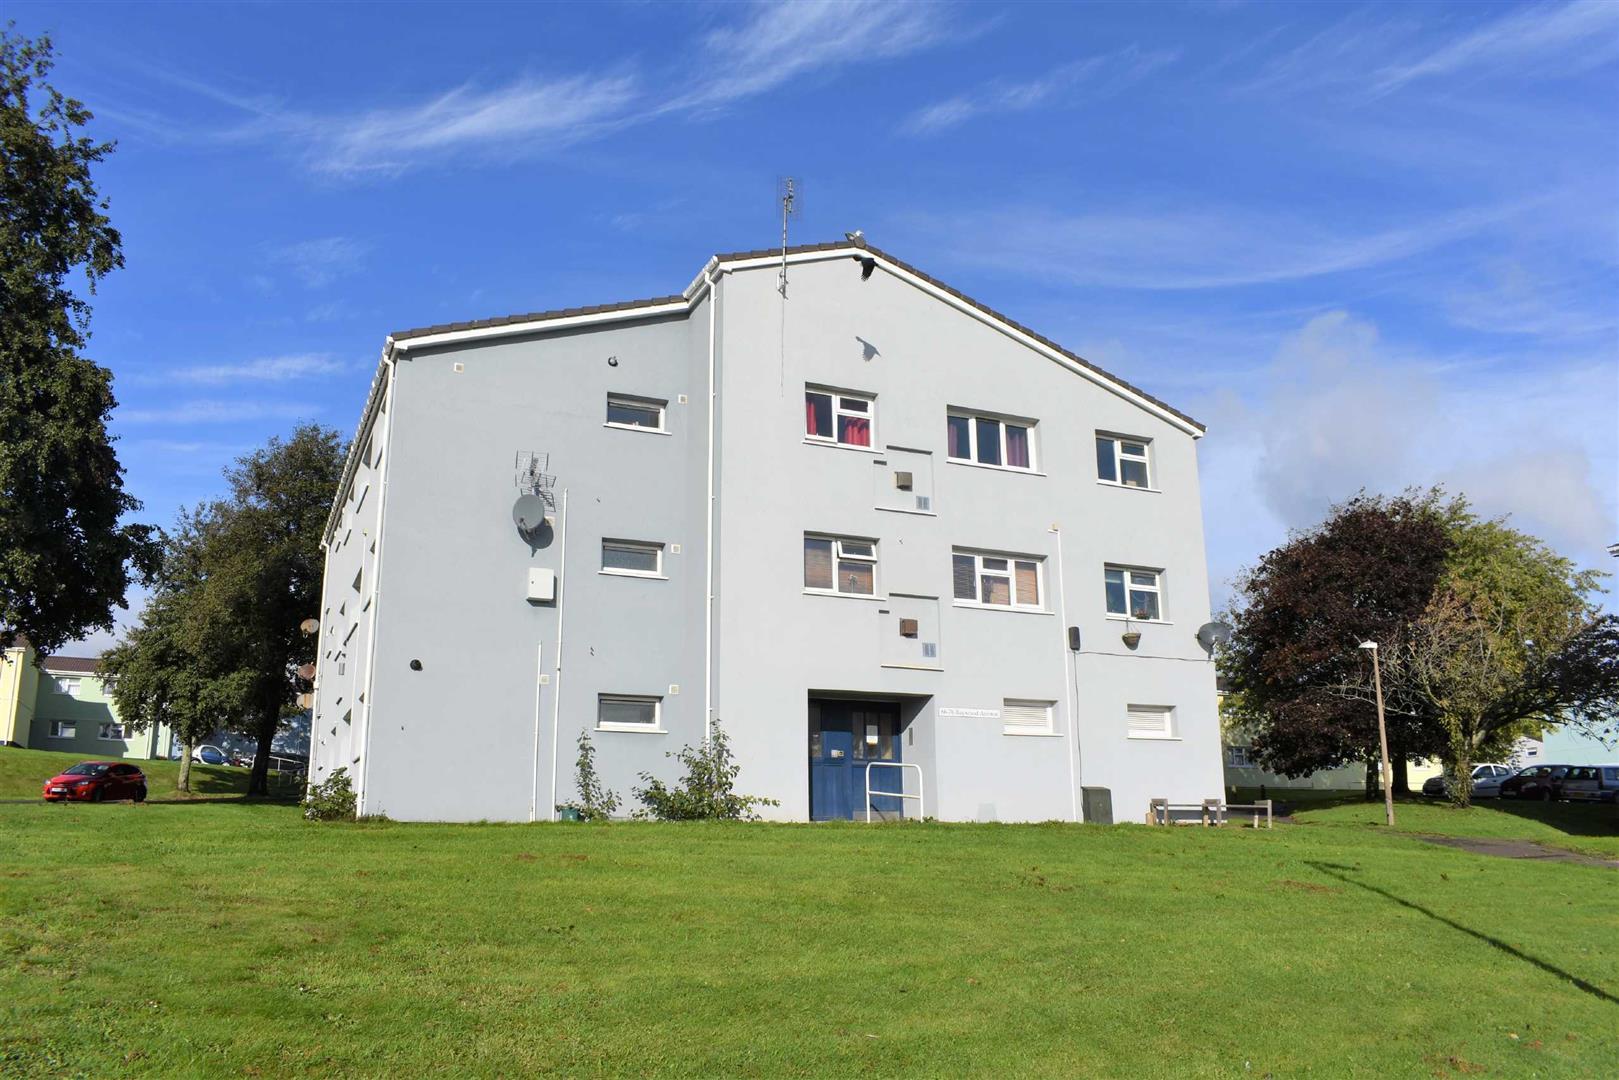 Baywood Avenue, West Cross, Swansea, SA3 5LW